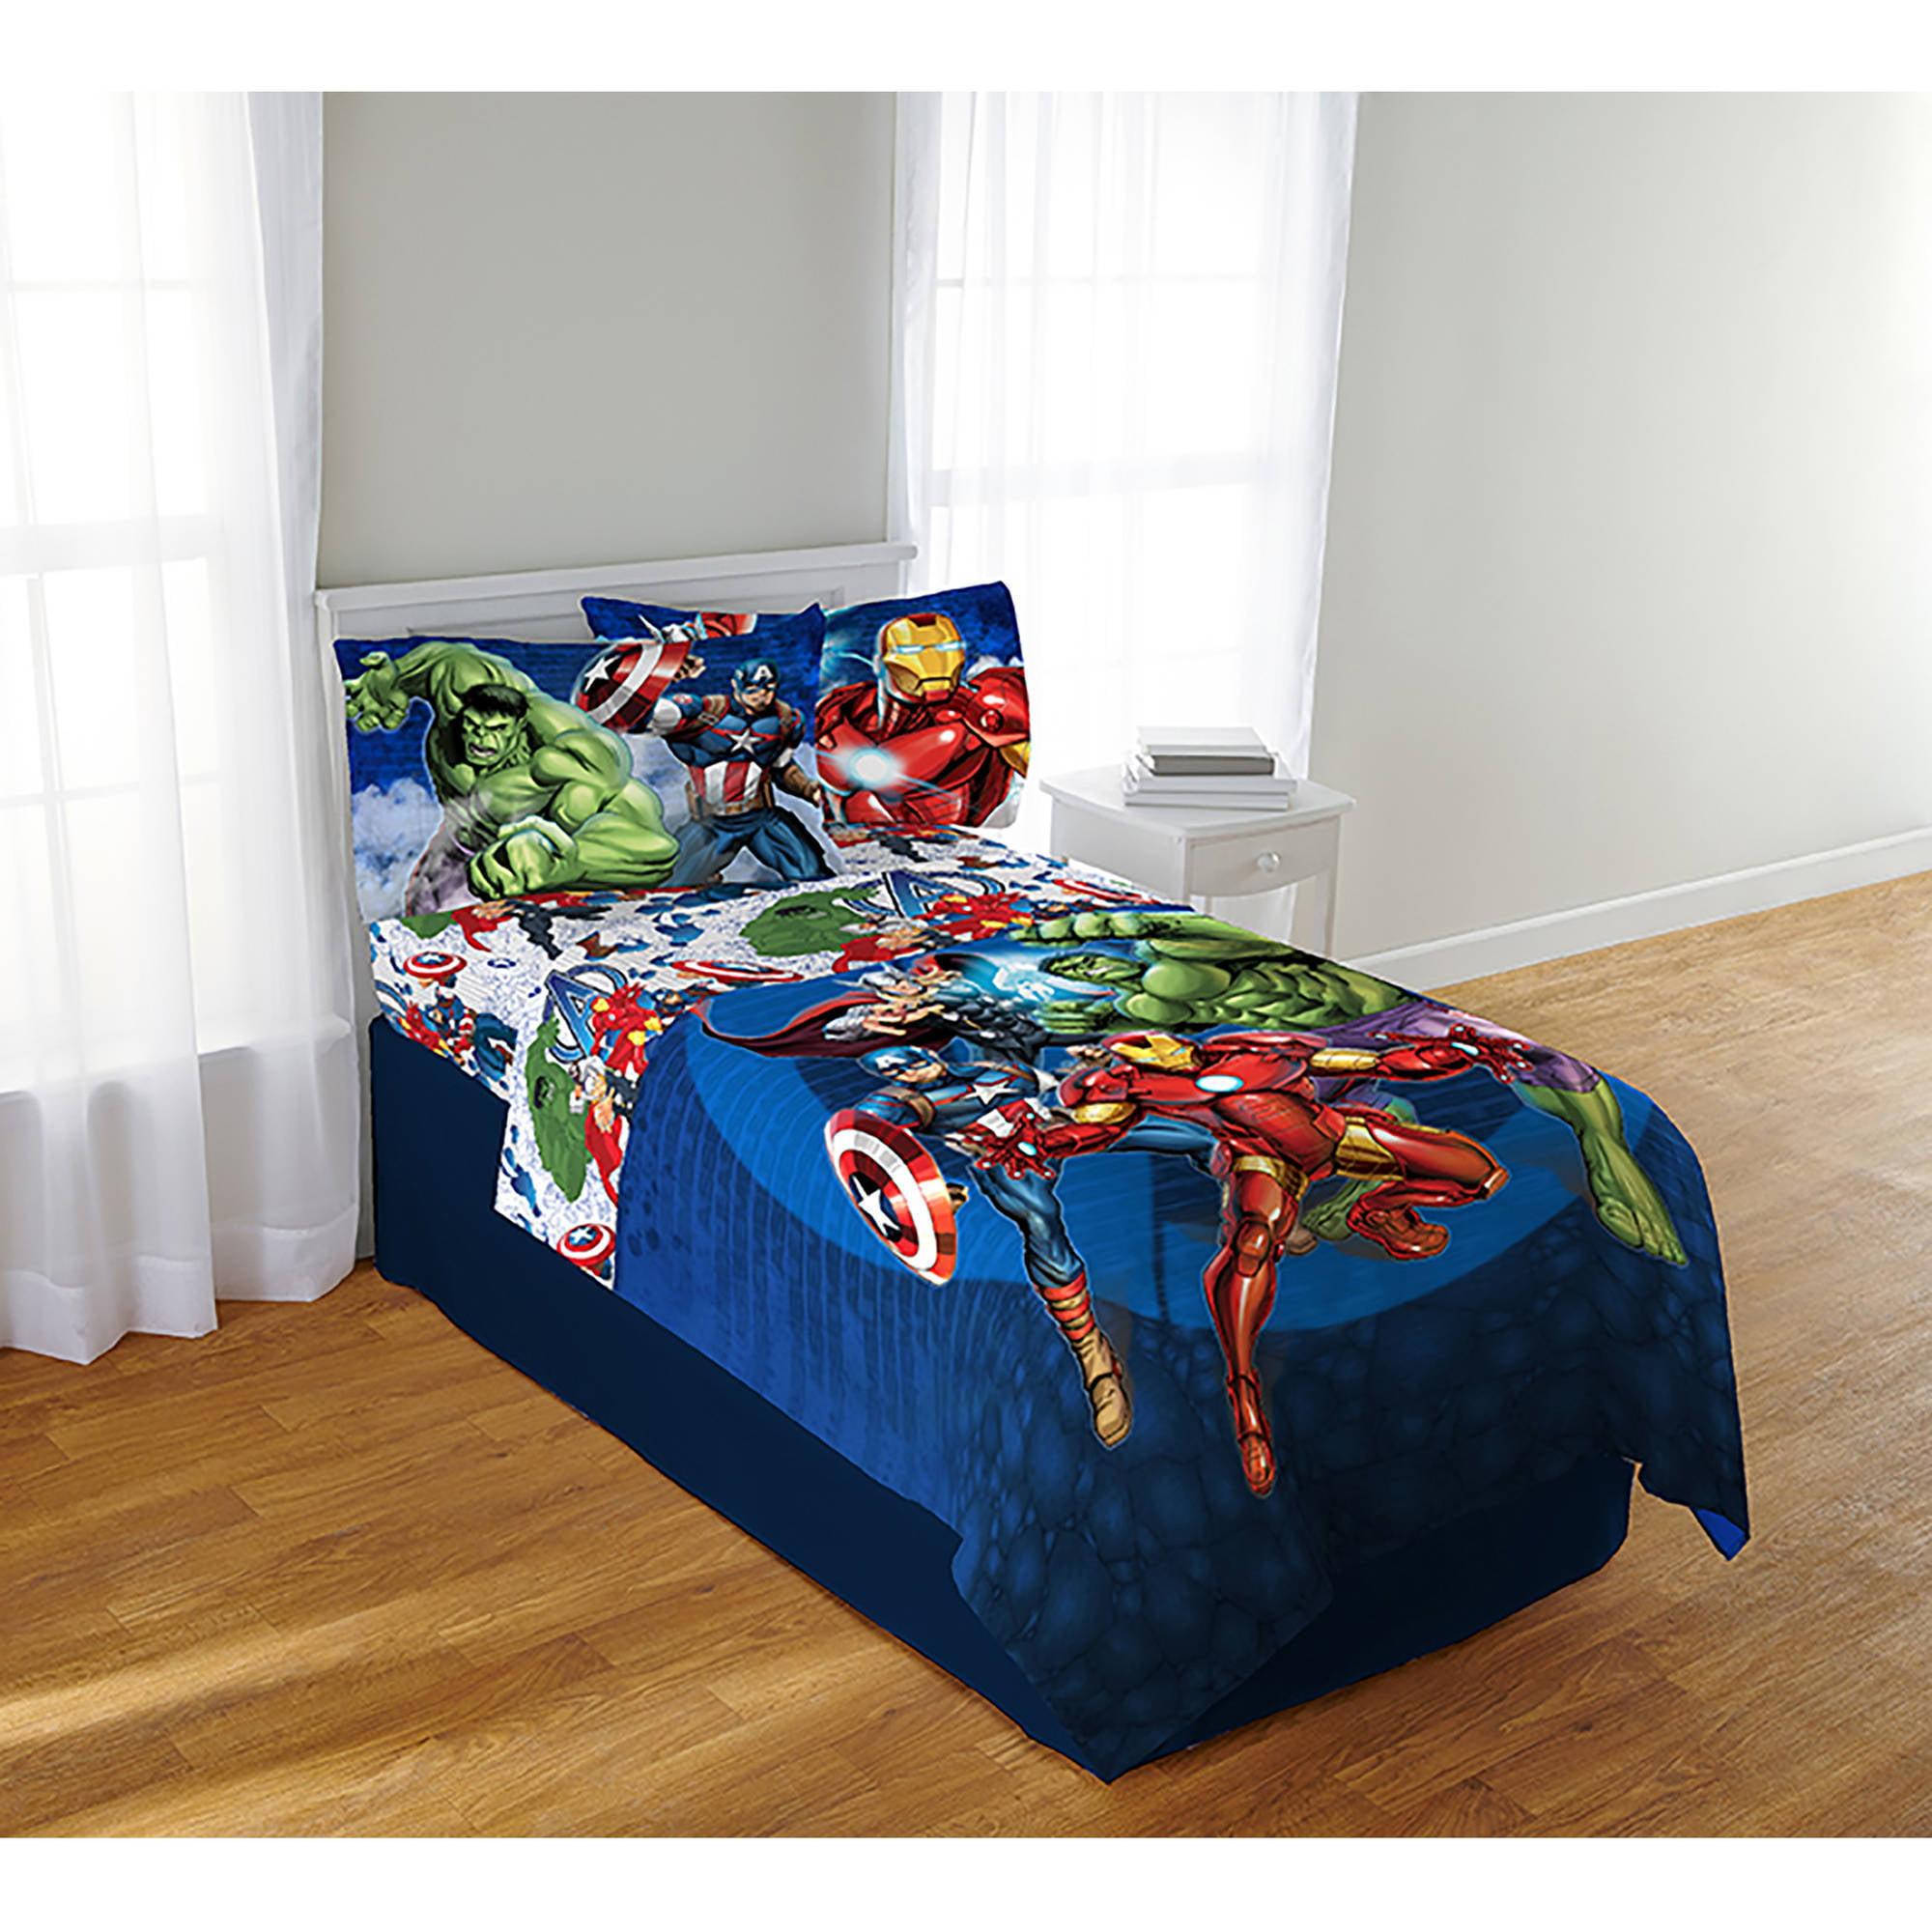 Marvel Avengers Blue Circle Bedding Twin Full Sheet Set 1 Each